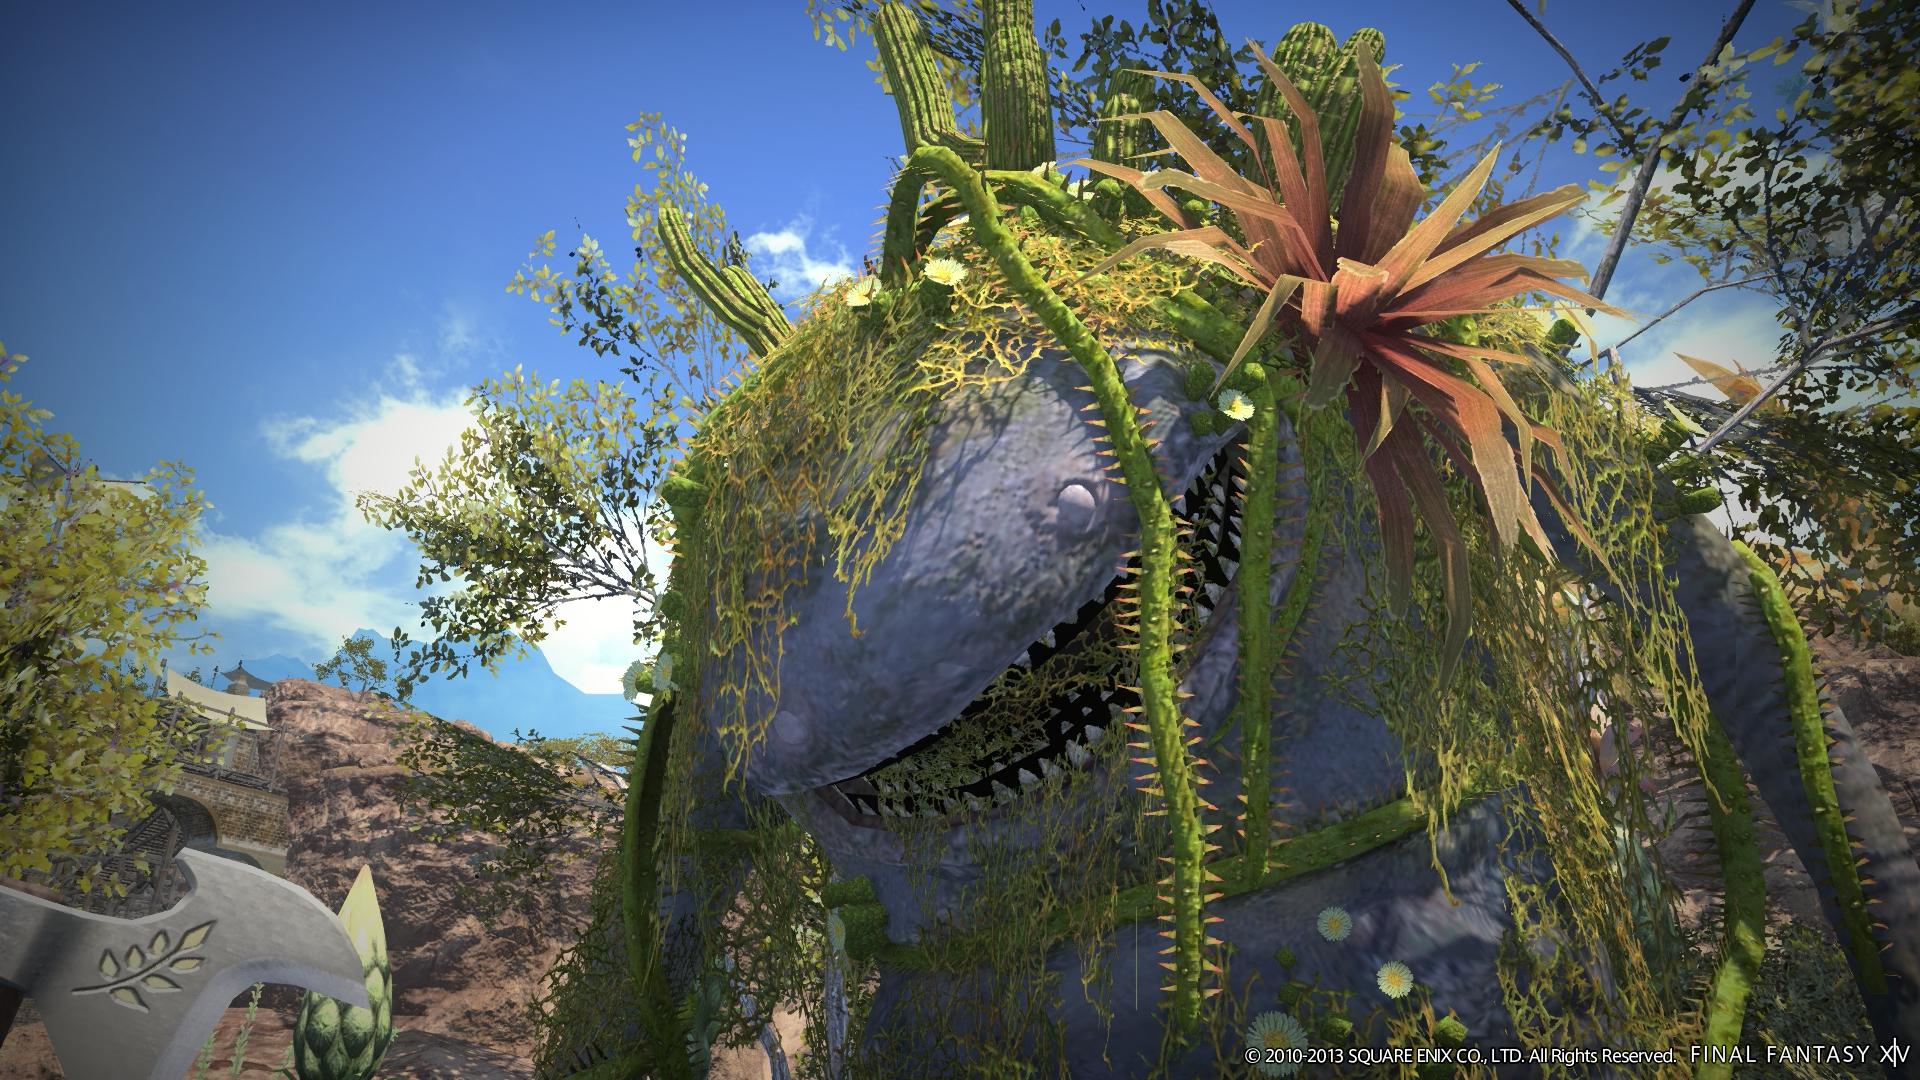 final-fantasy-xiv-a-realm-reborn-in-game-screenshots-pc-ps3-23.jpg